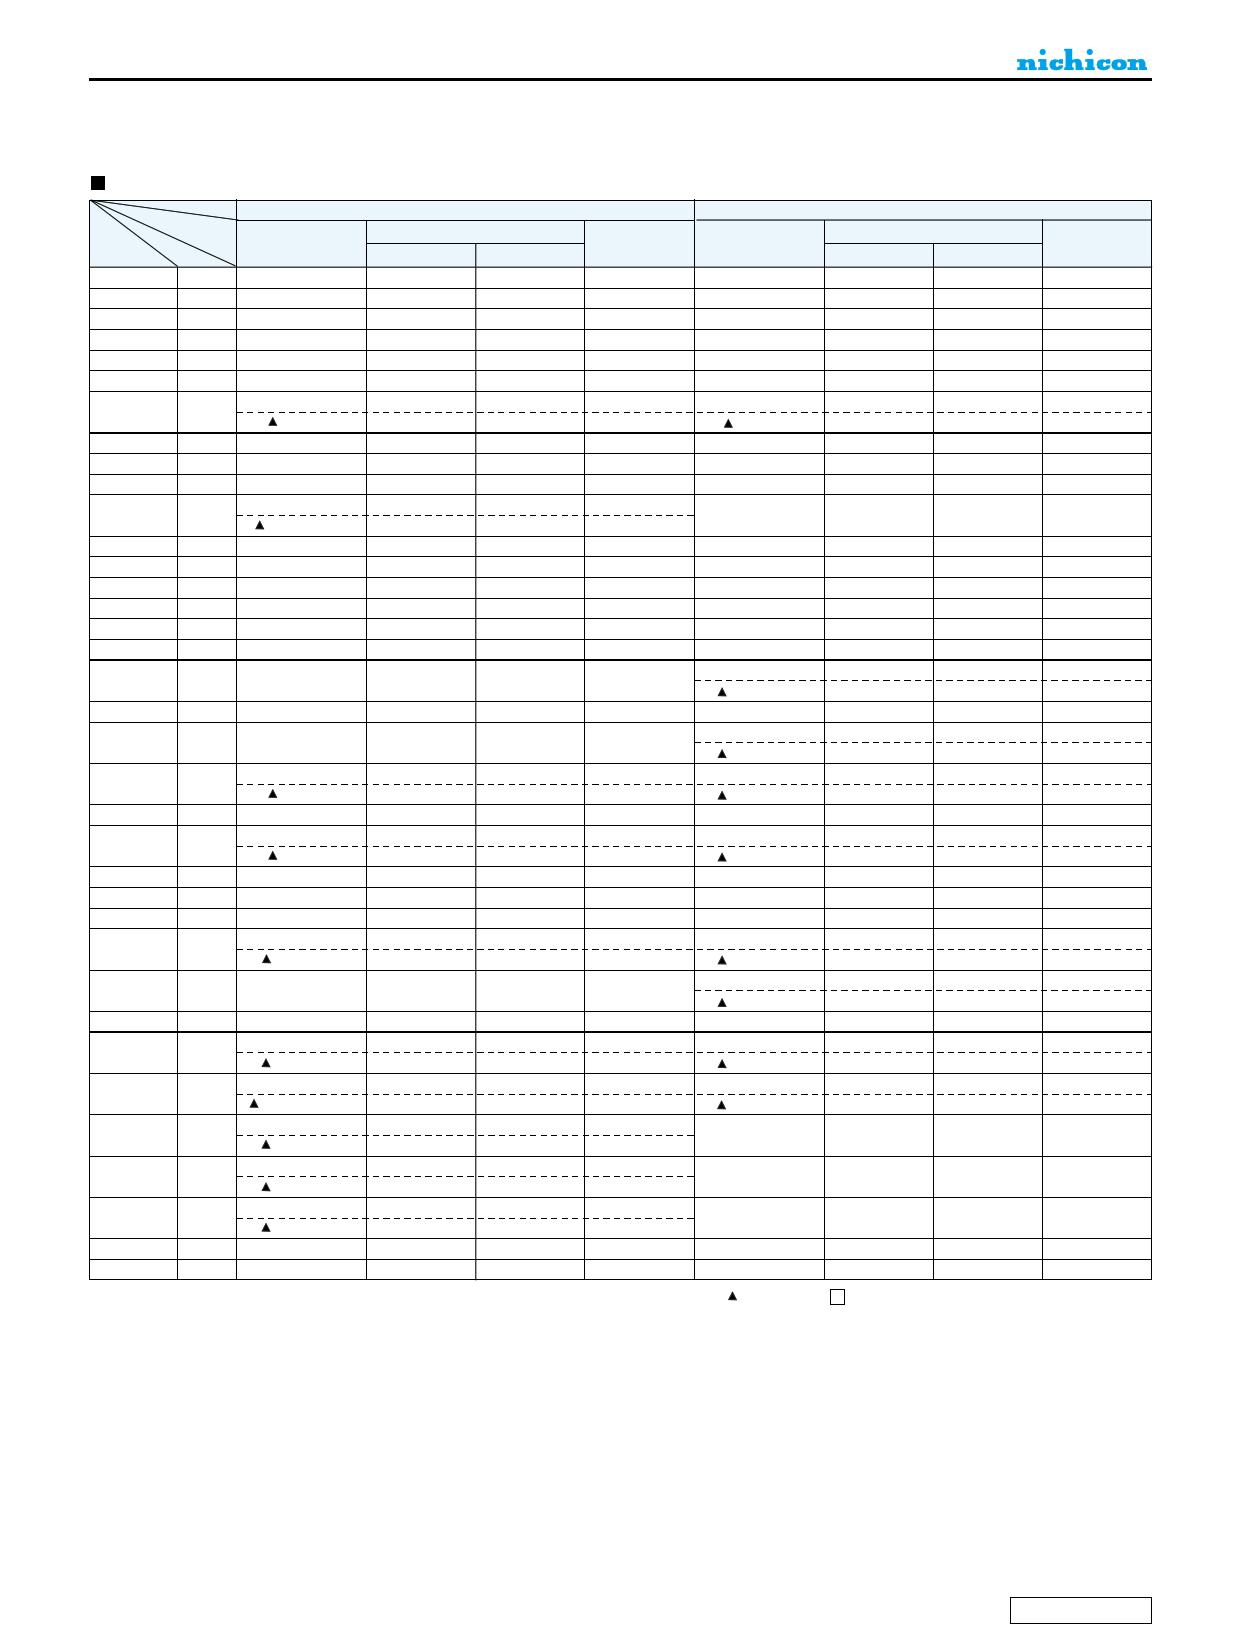 UPW1C681MPD1TD pdf, 반도체, 판매, 대치품